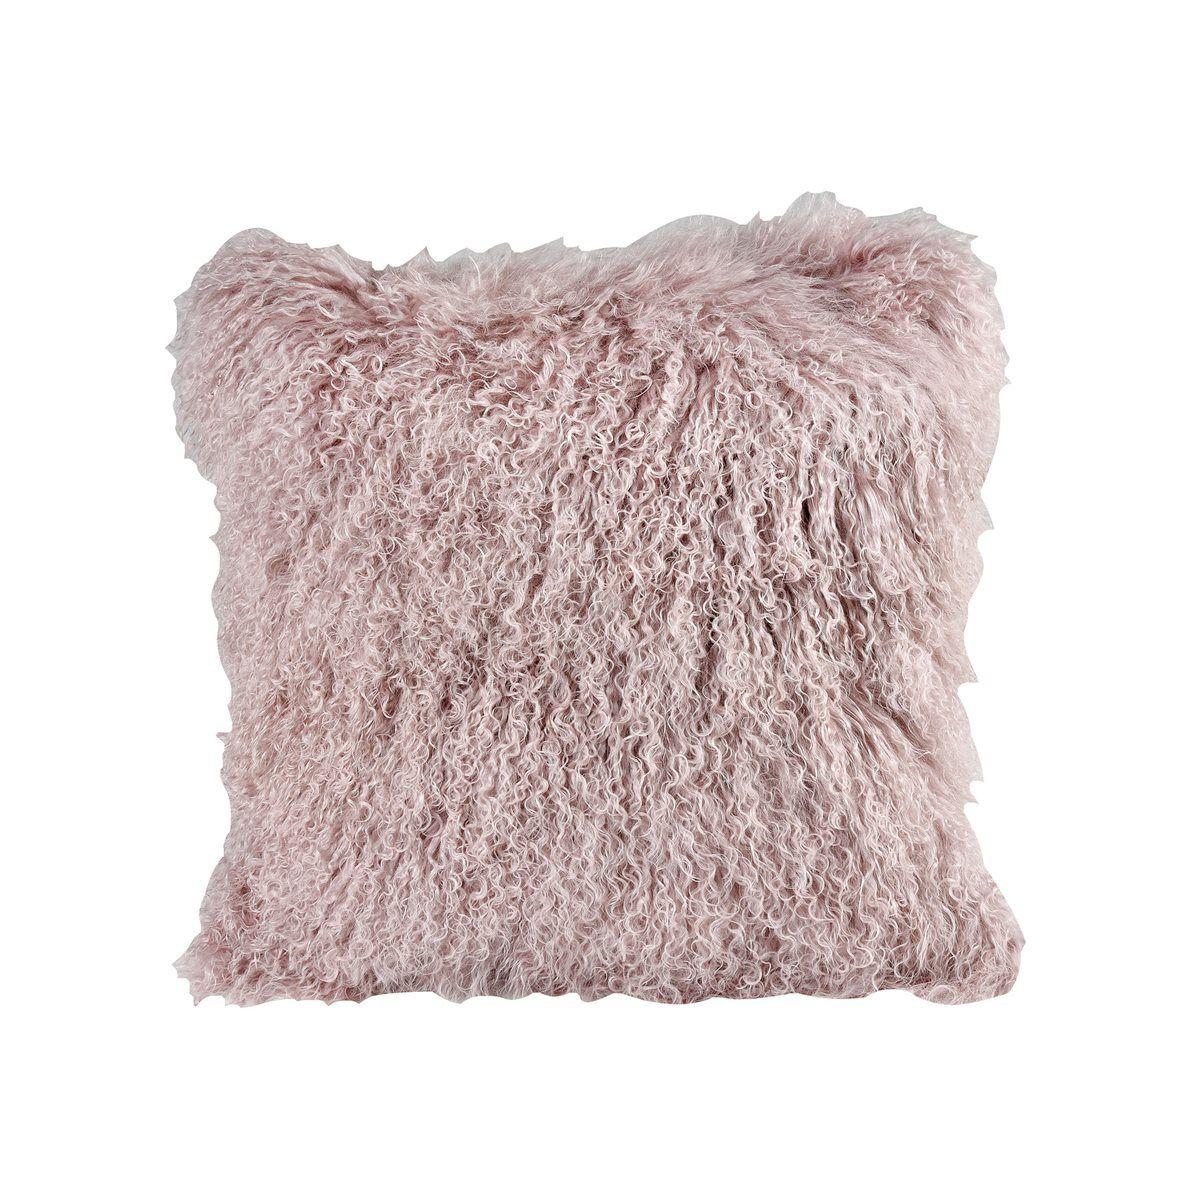 Pink Apres Ski Pillow By Elk Home Seven Colonial Pink Accent Pillow Pillows Throw Pillows